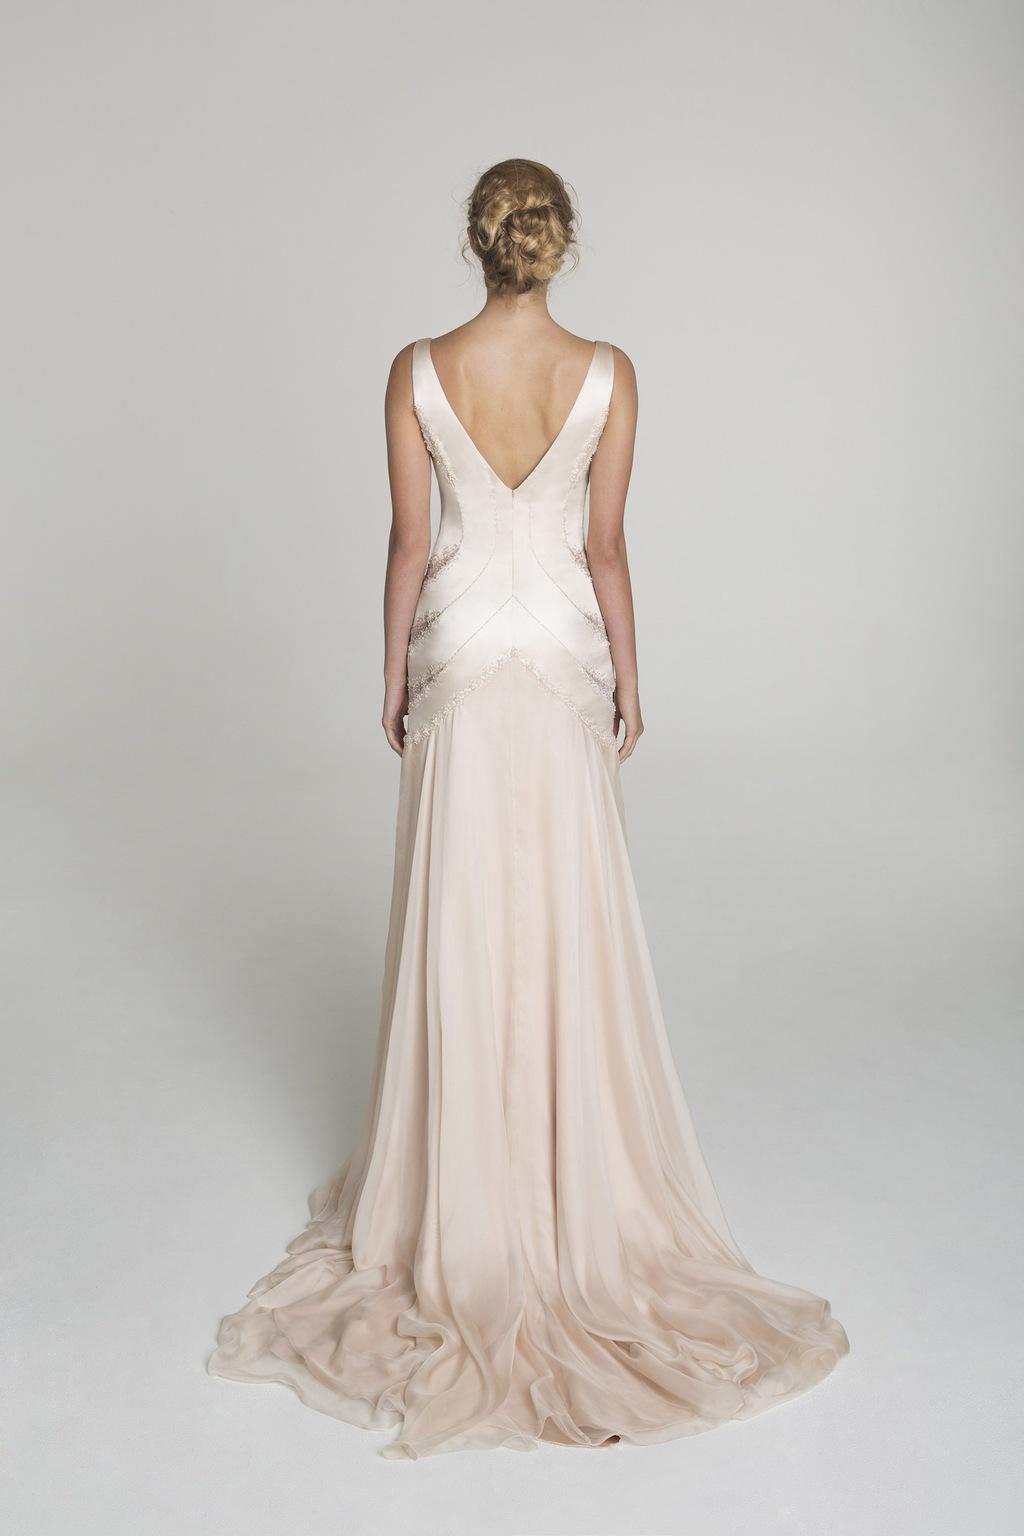 Blush_wedding_dress_from_alana_aoun_back.full